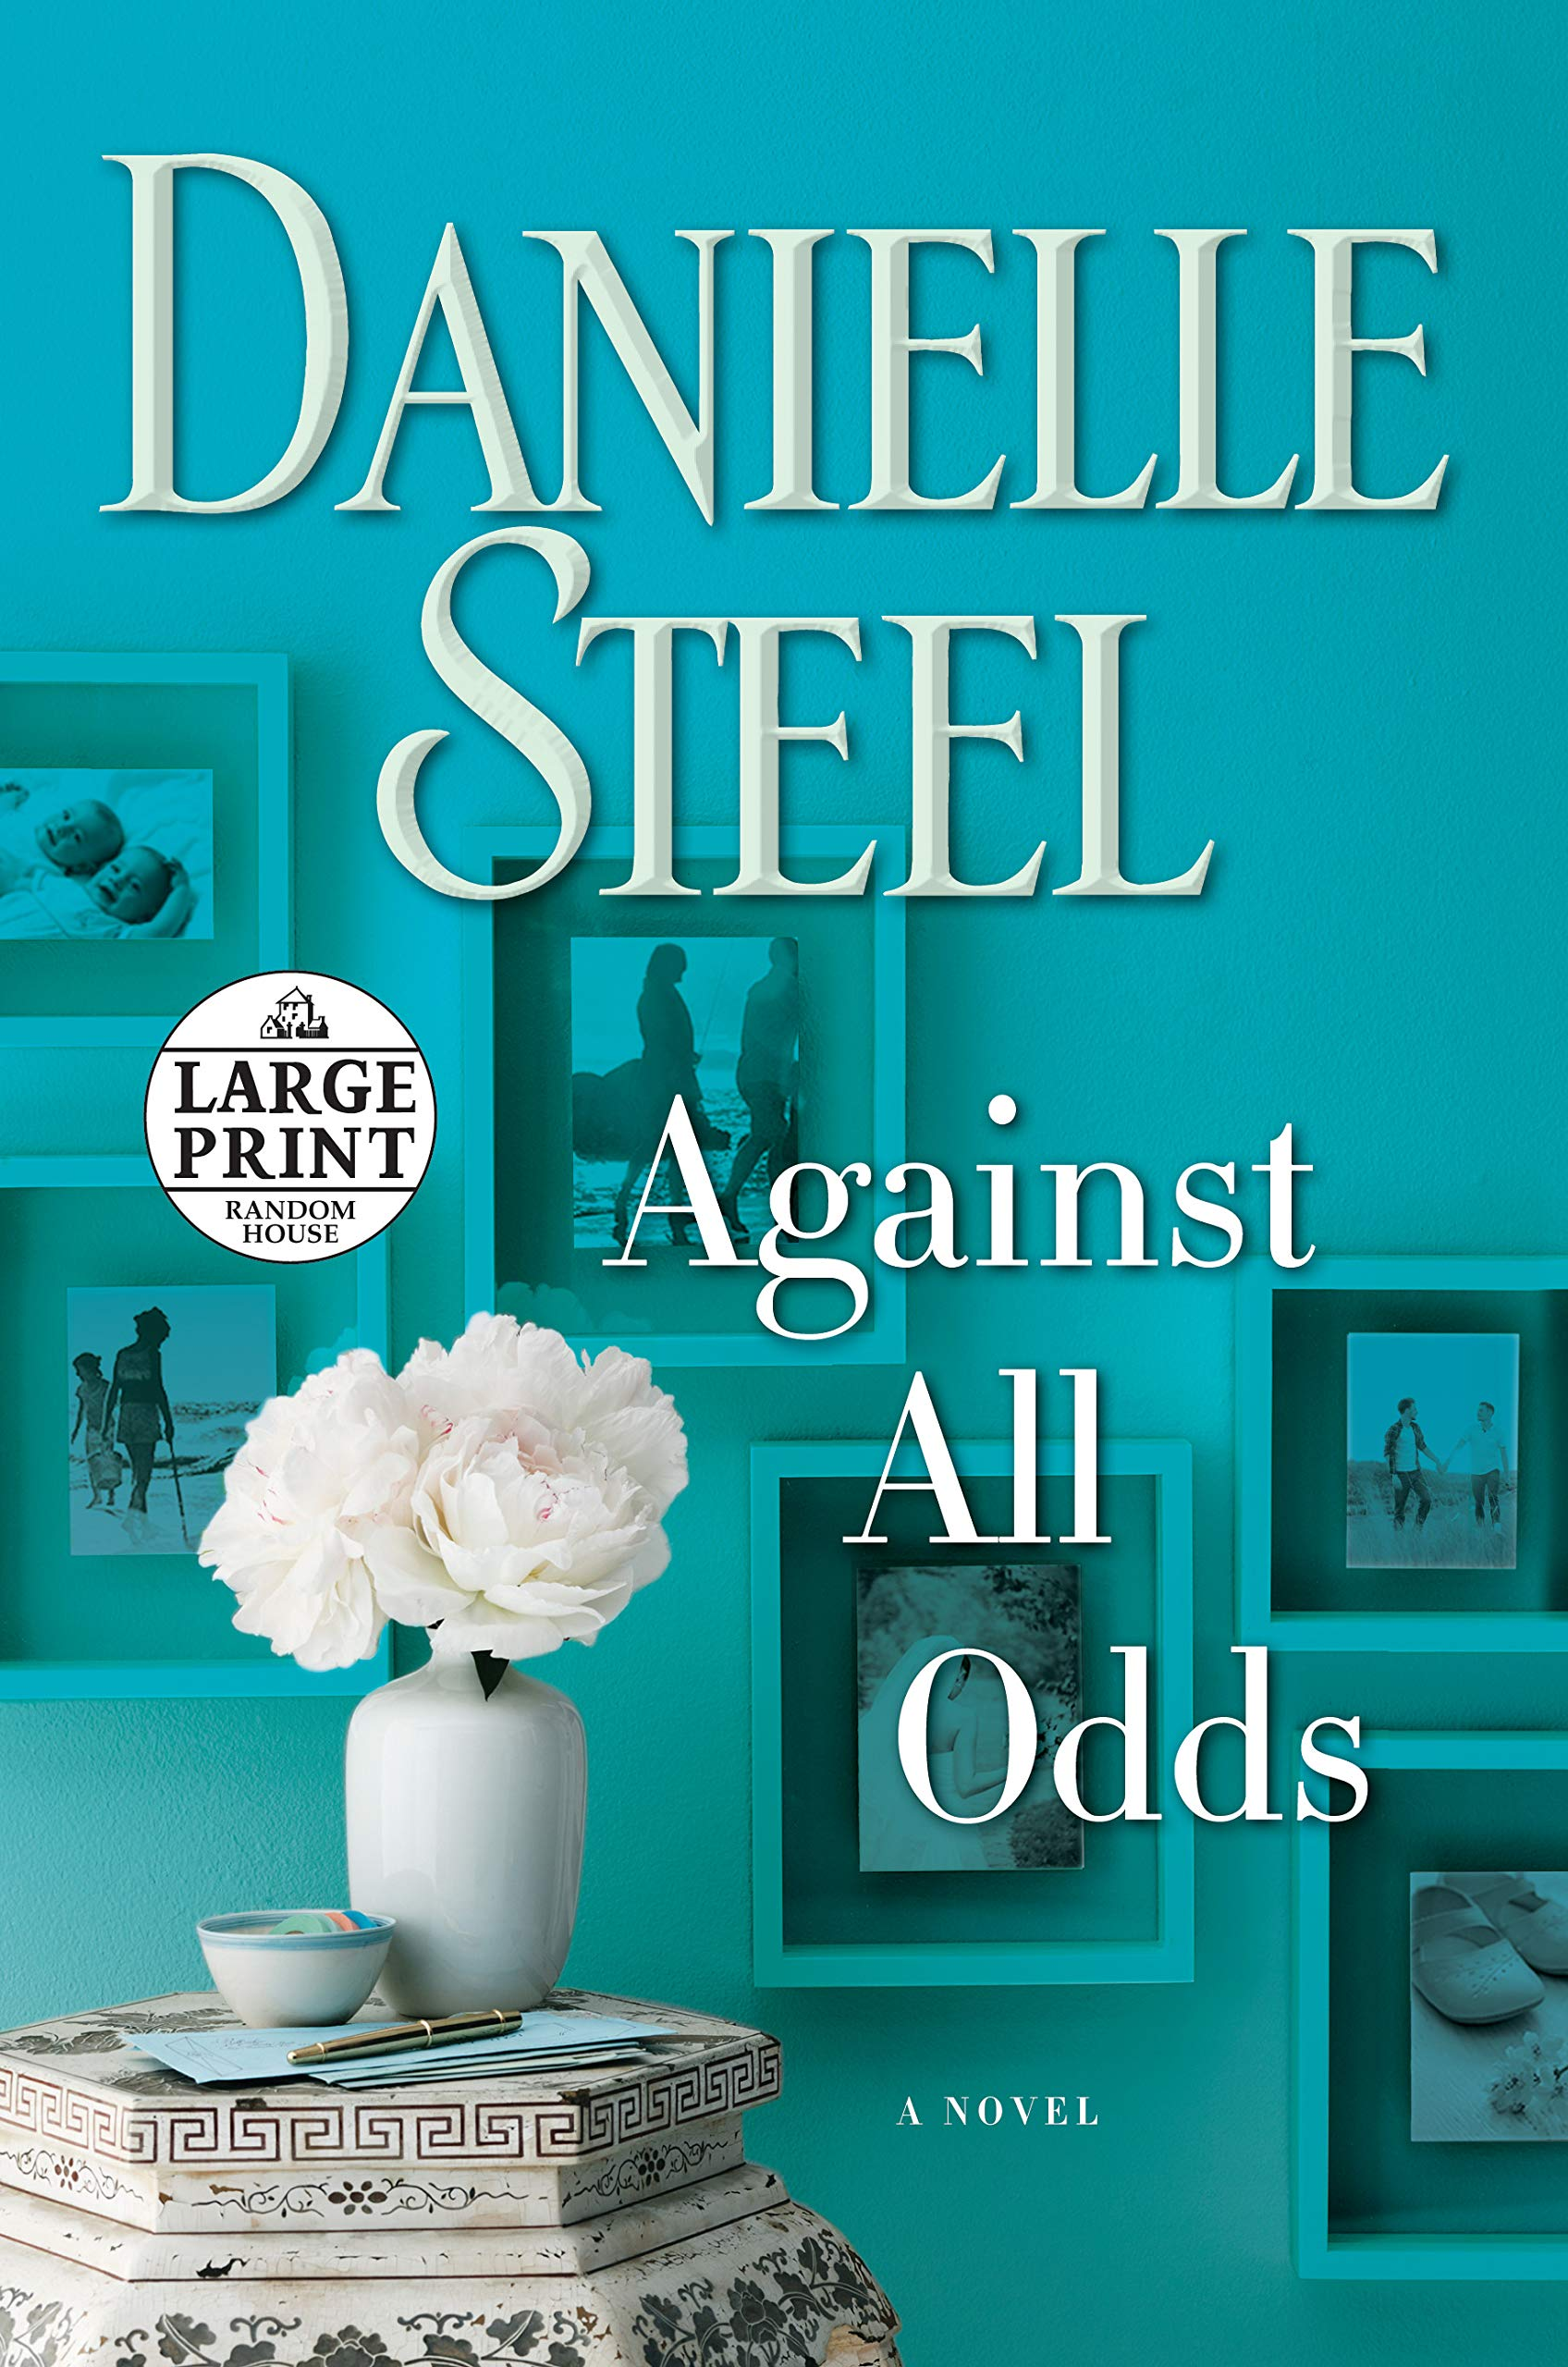 510a44a08bbb Against All Odds  A Novel (Random House Large Print)  Danielle Steel ...